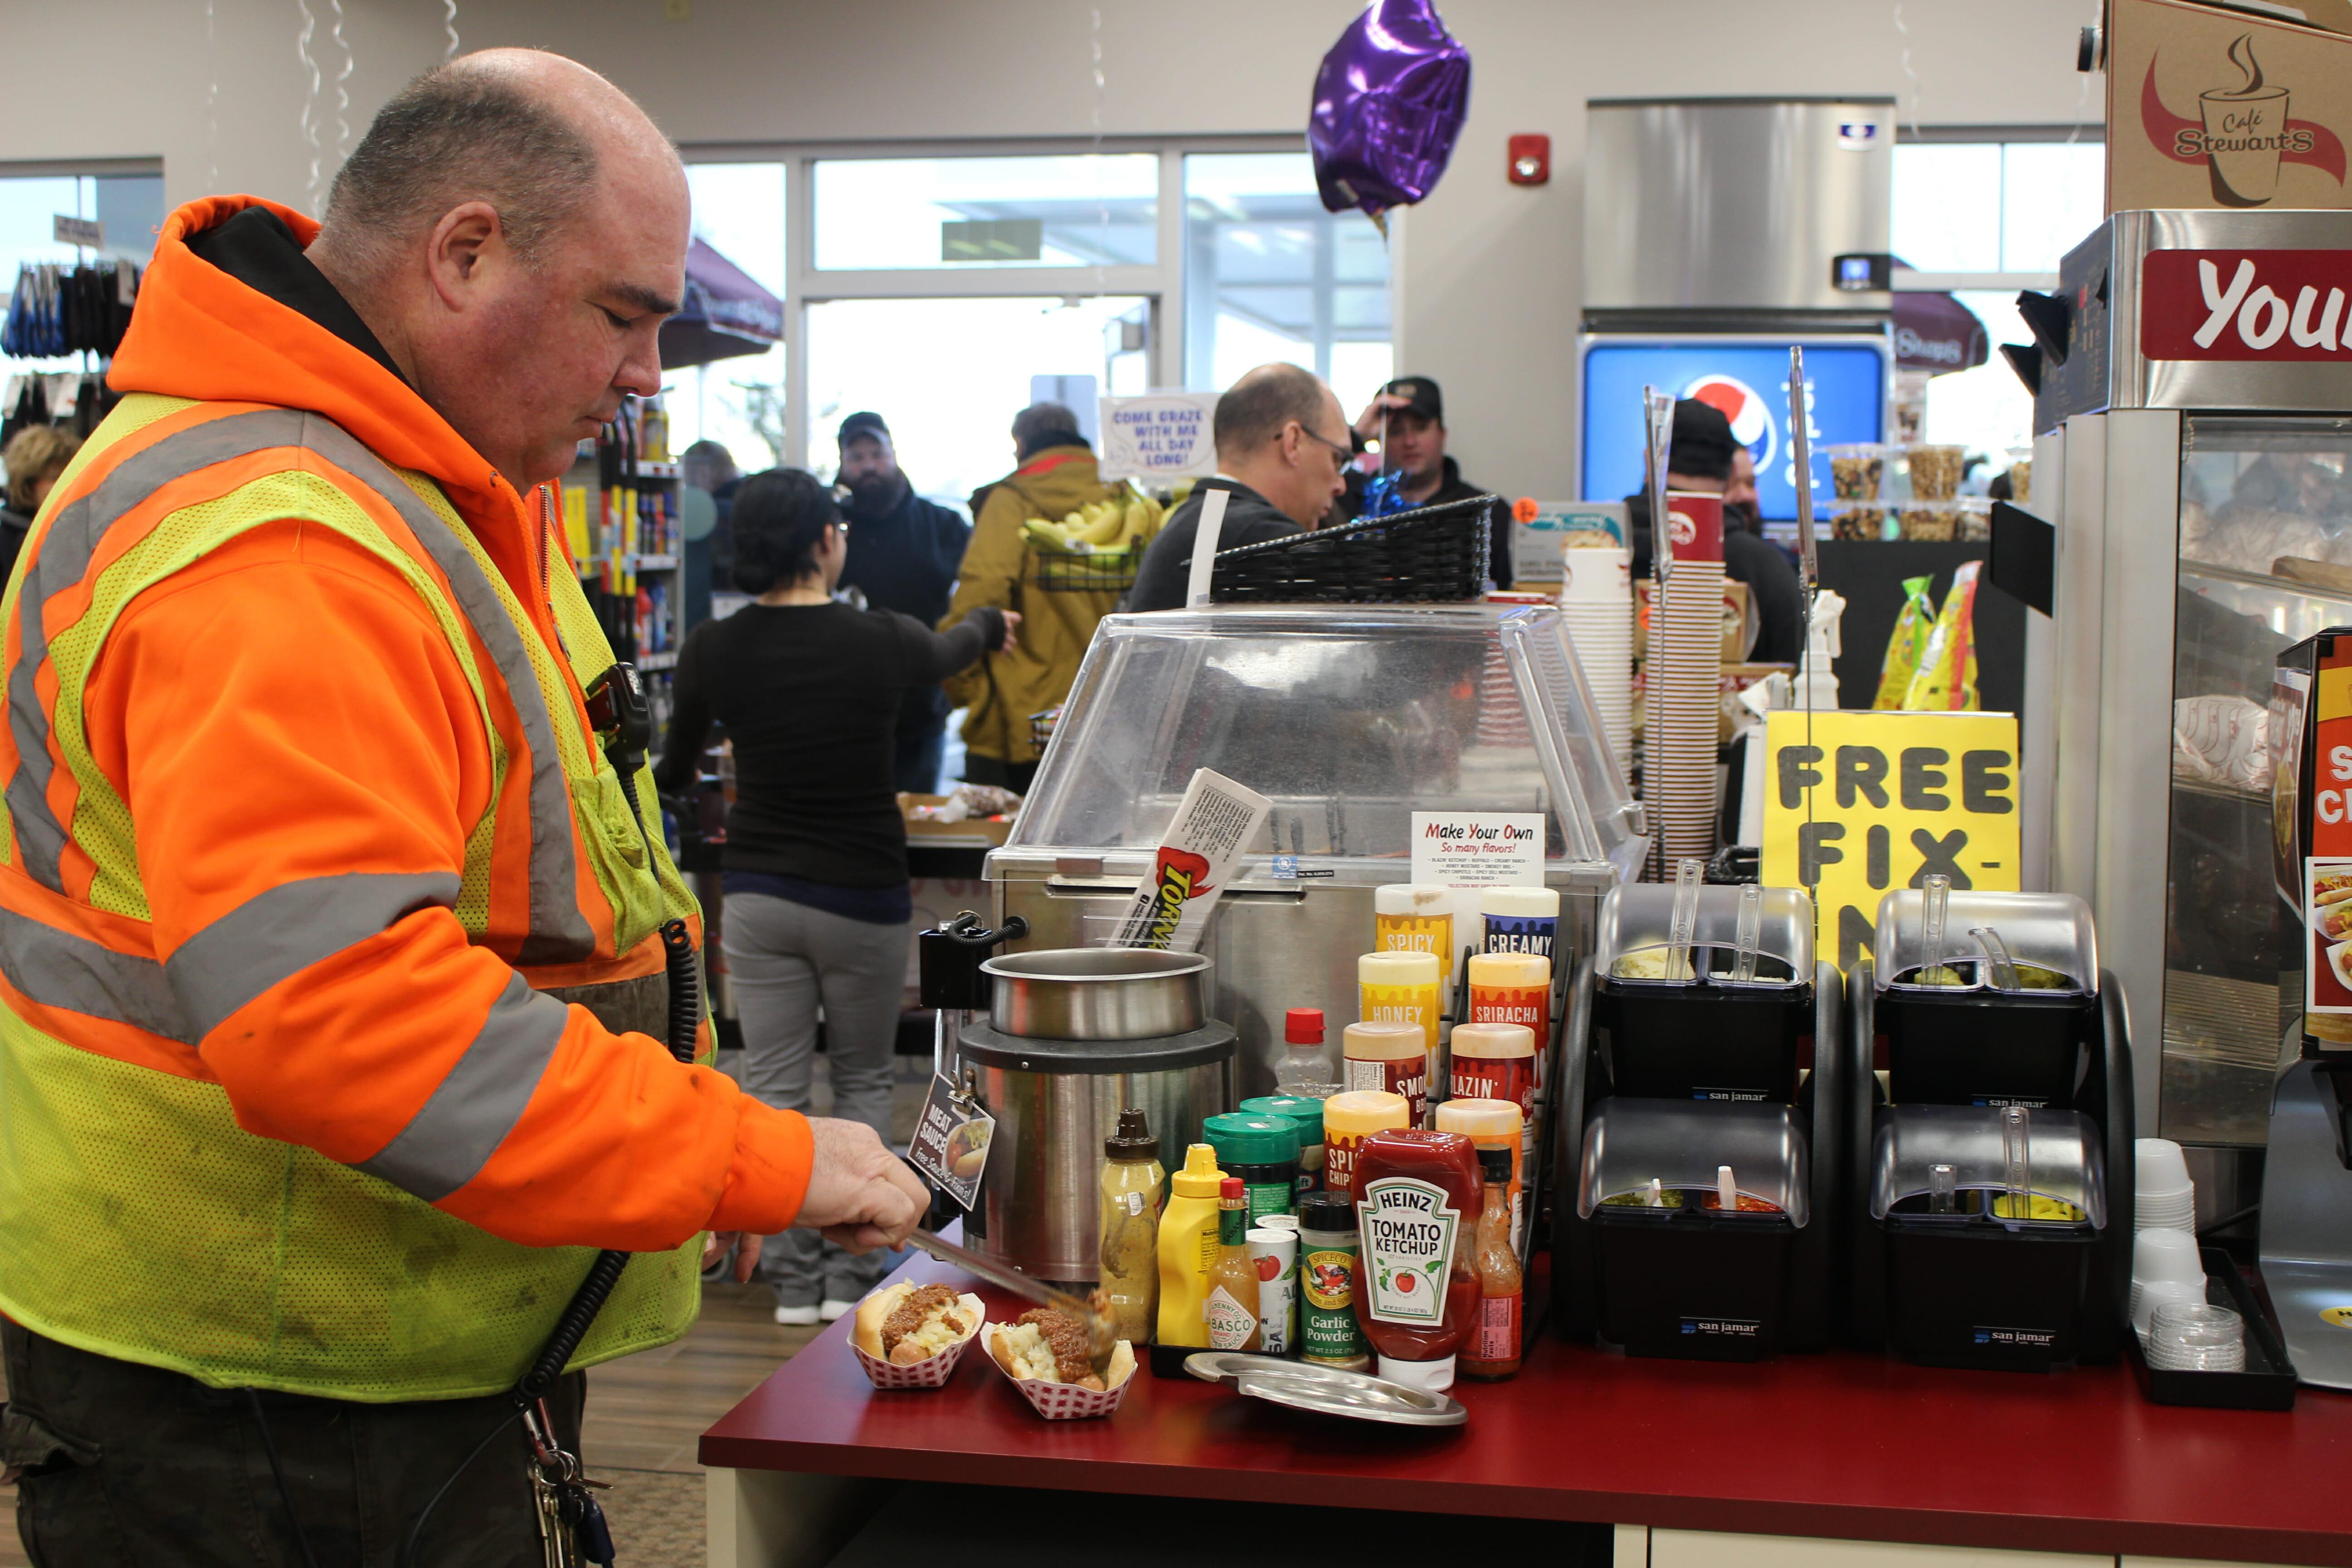 A man making a Make Your Own Hot Dog inside a Stewarts Shop